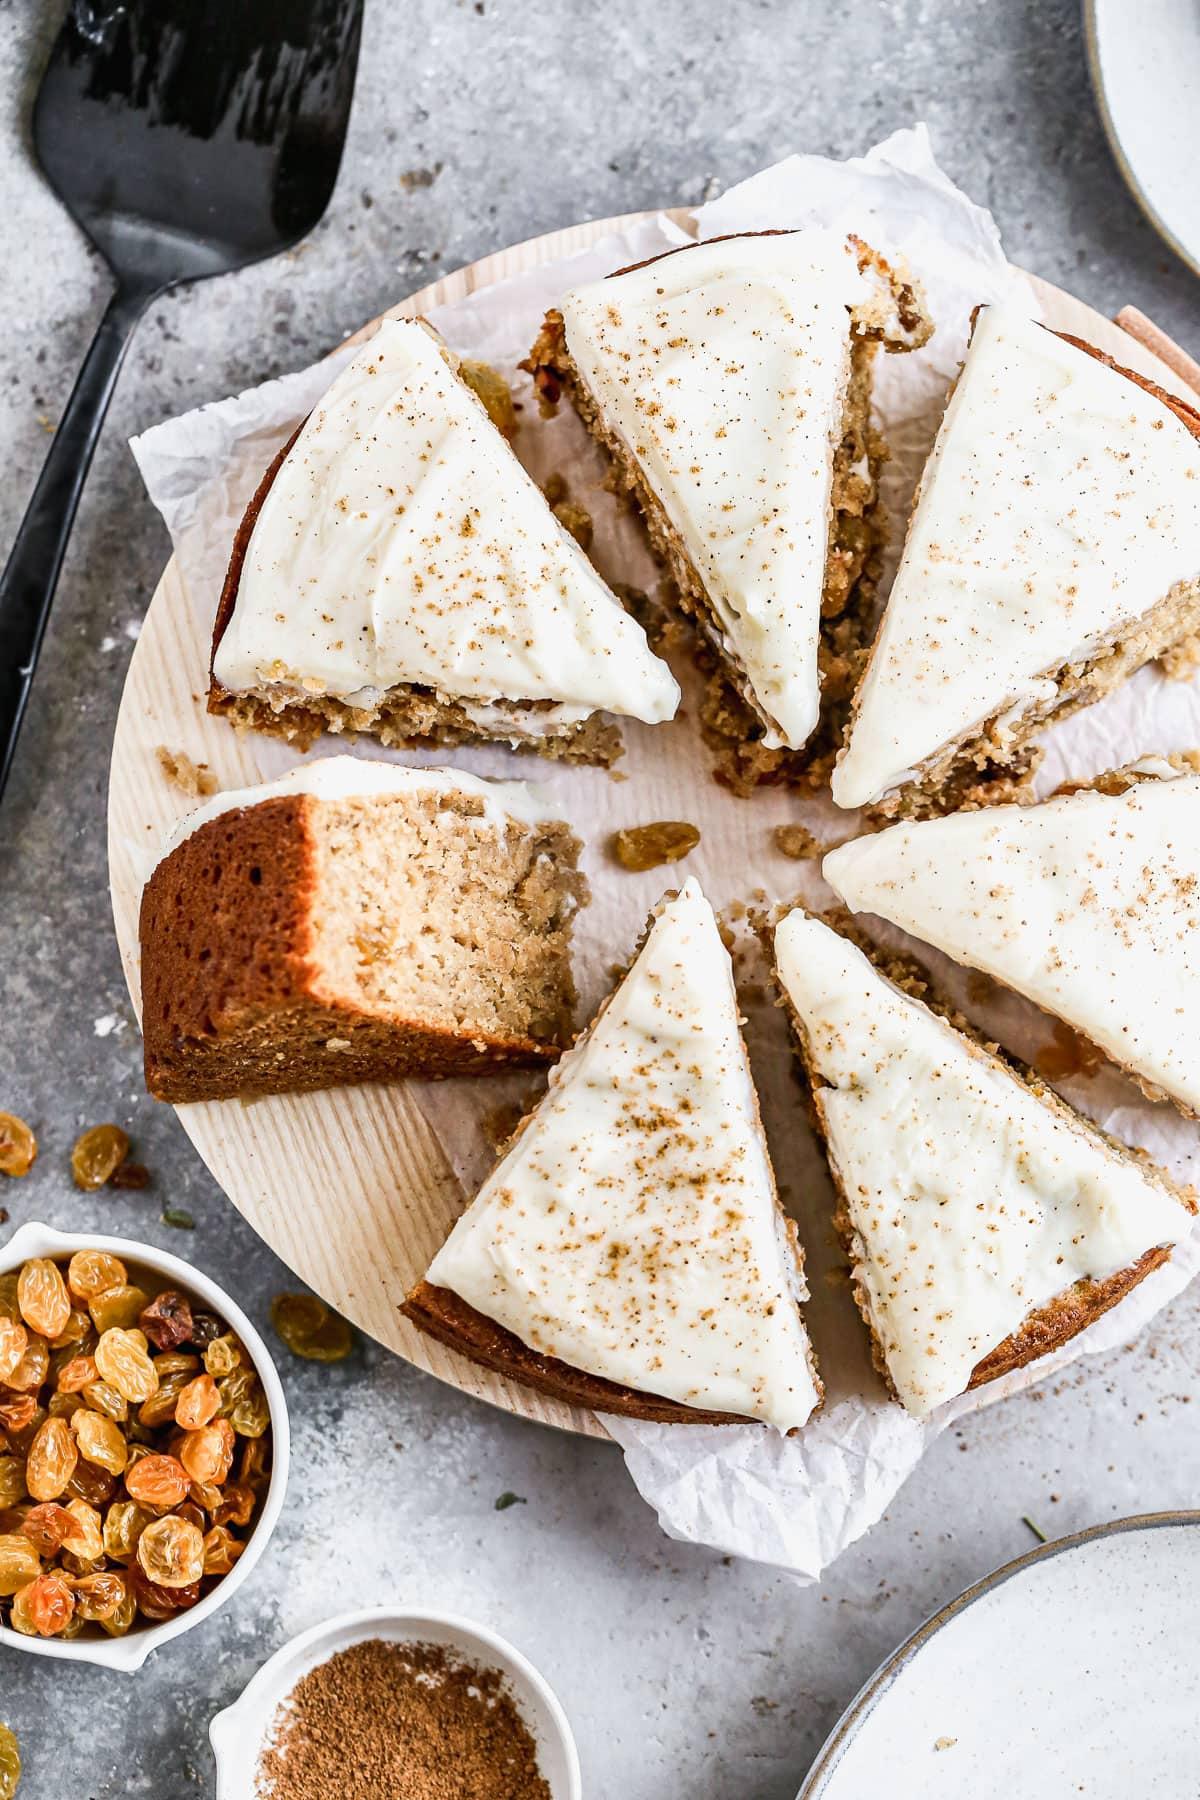 Cut slices of applesauce cake